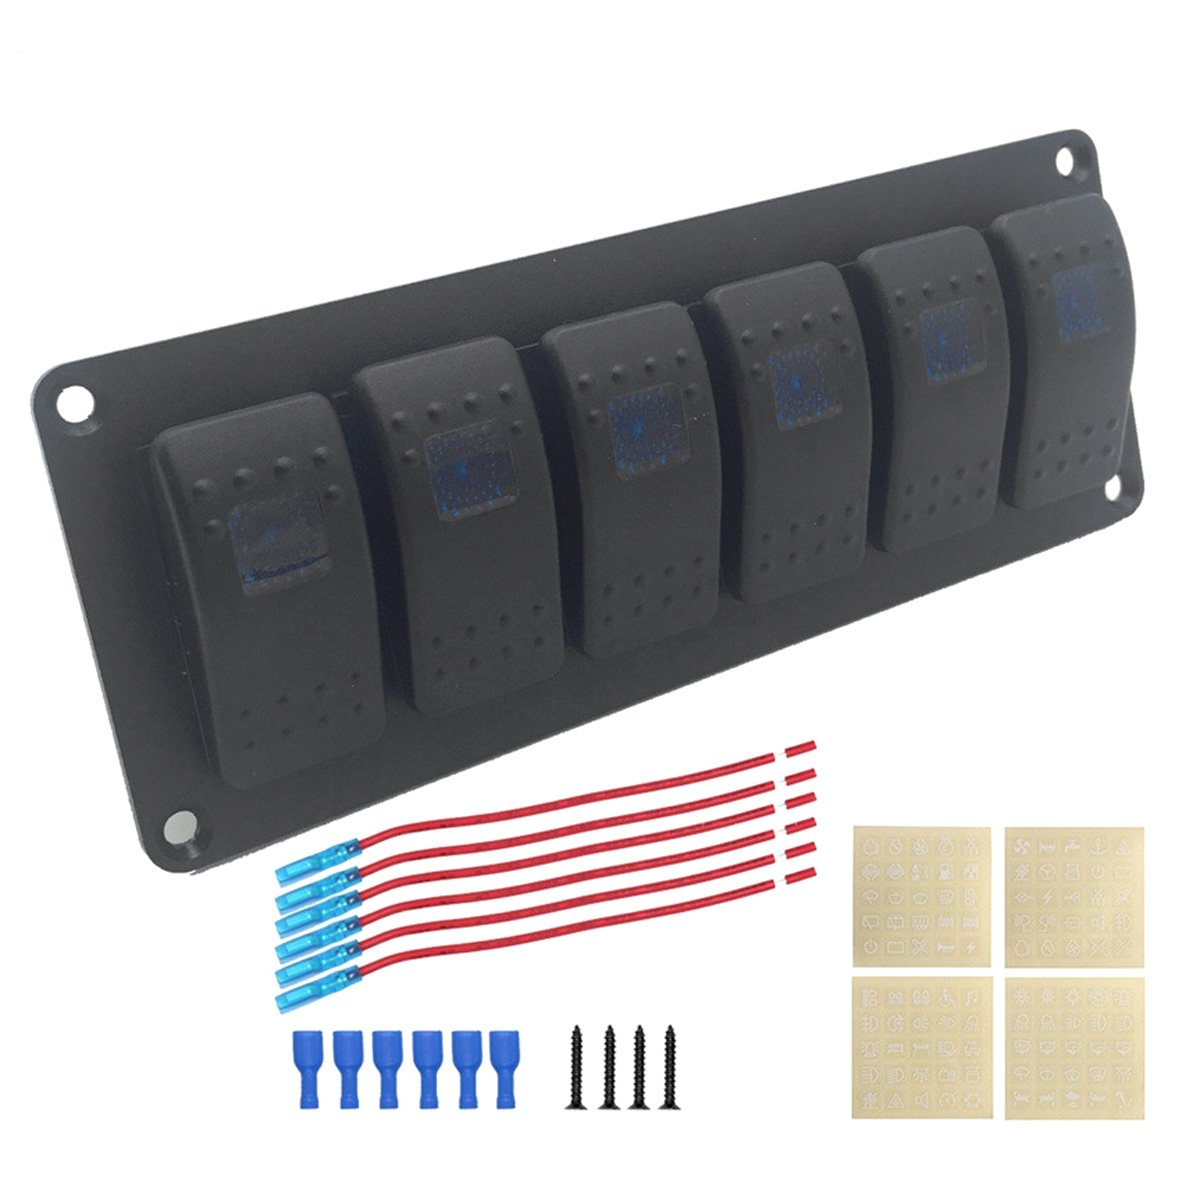 OLSUS DIY Car Refitting 6-Group Switch Panel